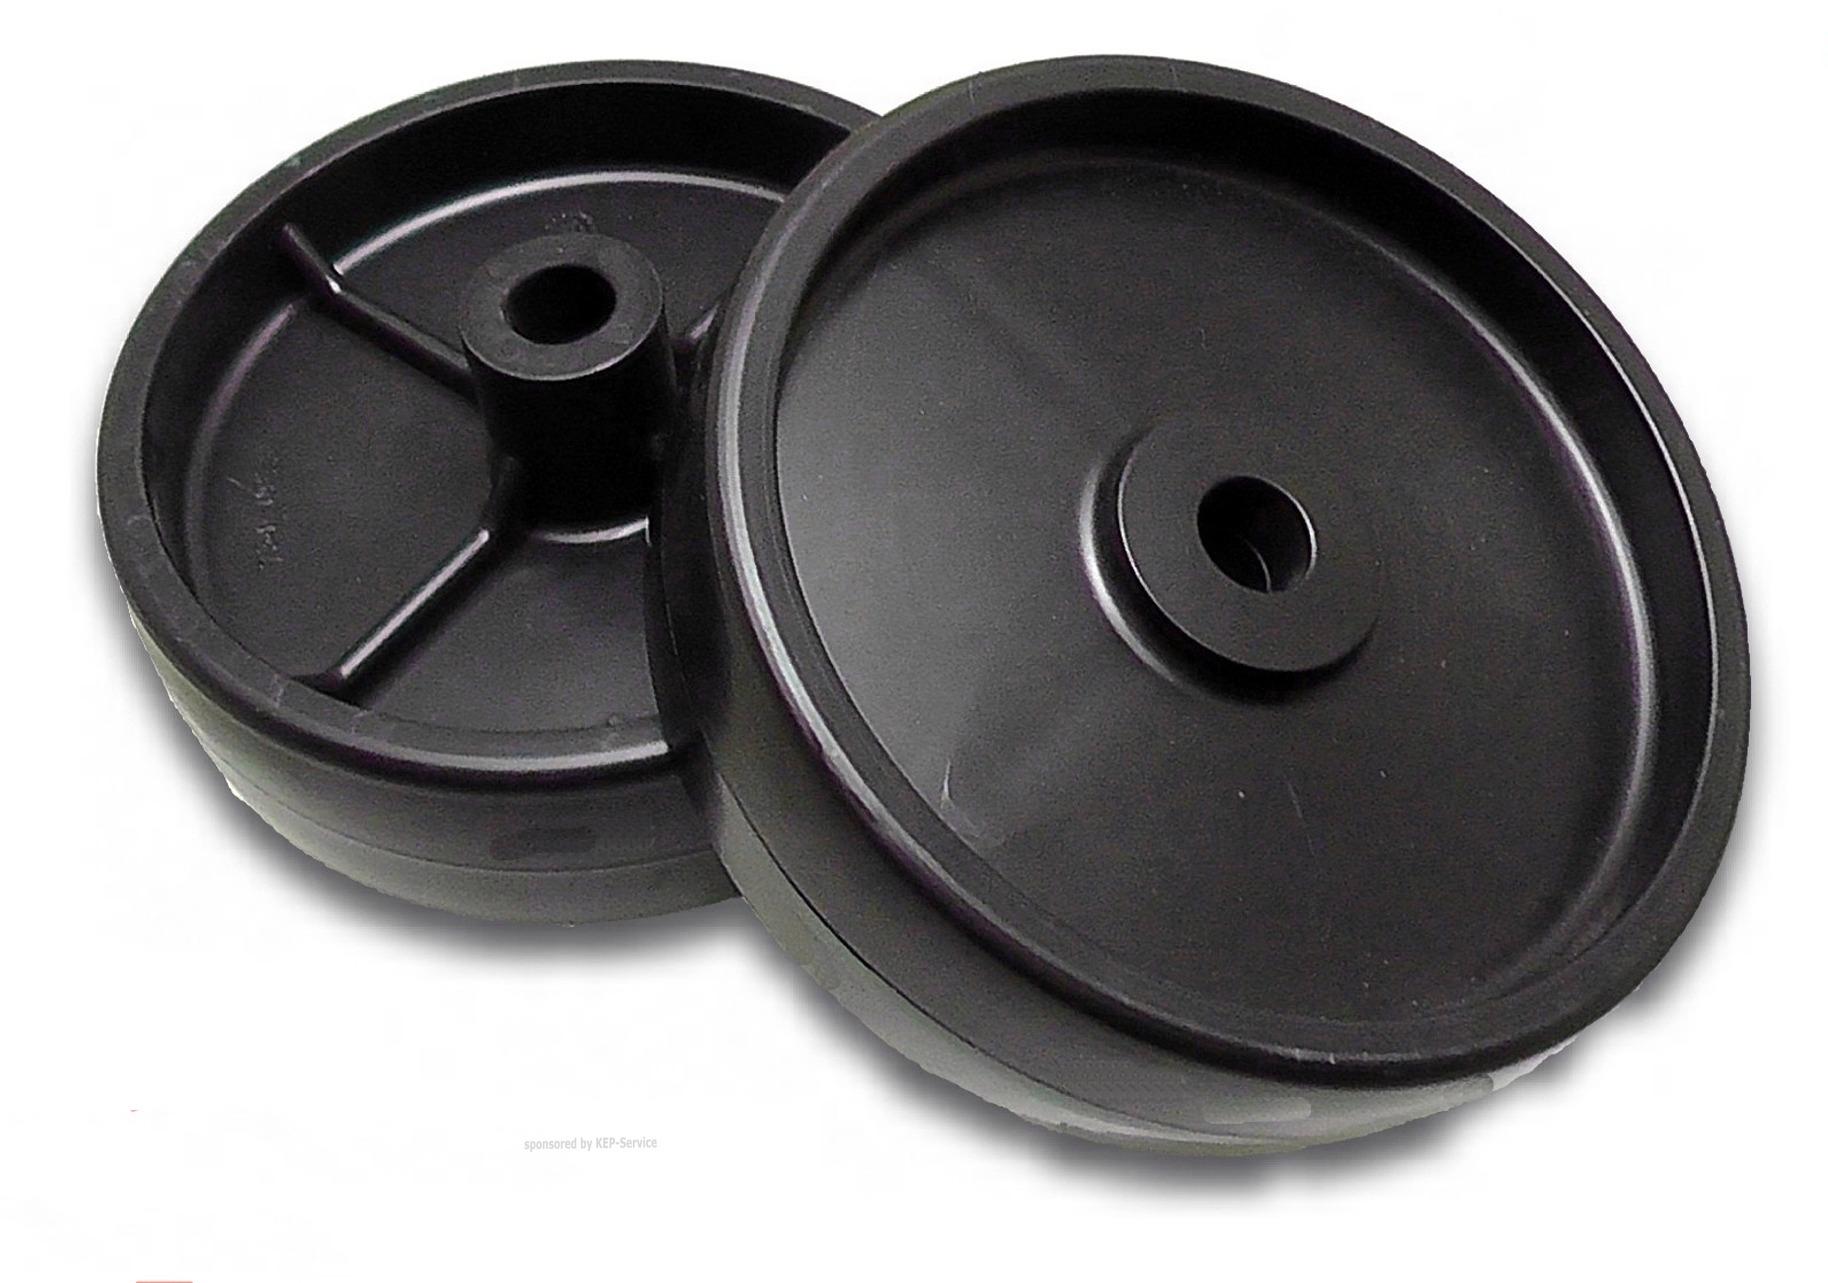 2 deckrad m hdeck laufrad rolle tastrad m hwerksrolle oleo. Black Bedroom Furniture Sets. Home Design Ideas